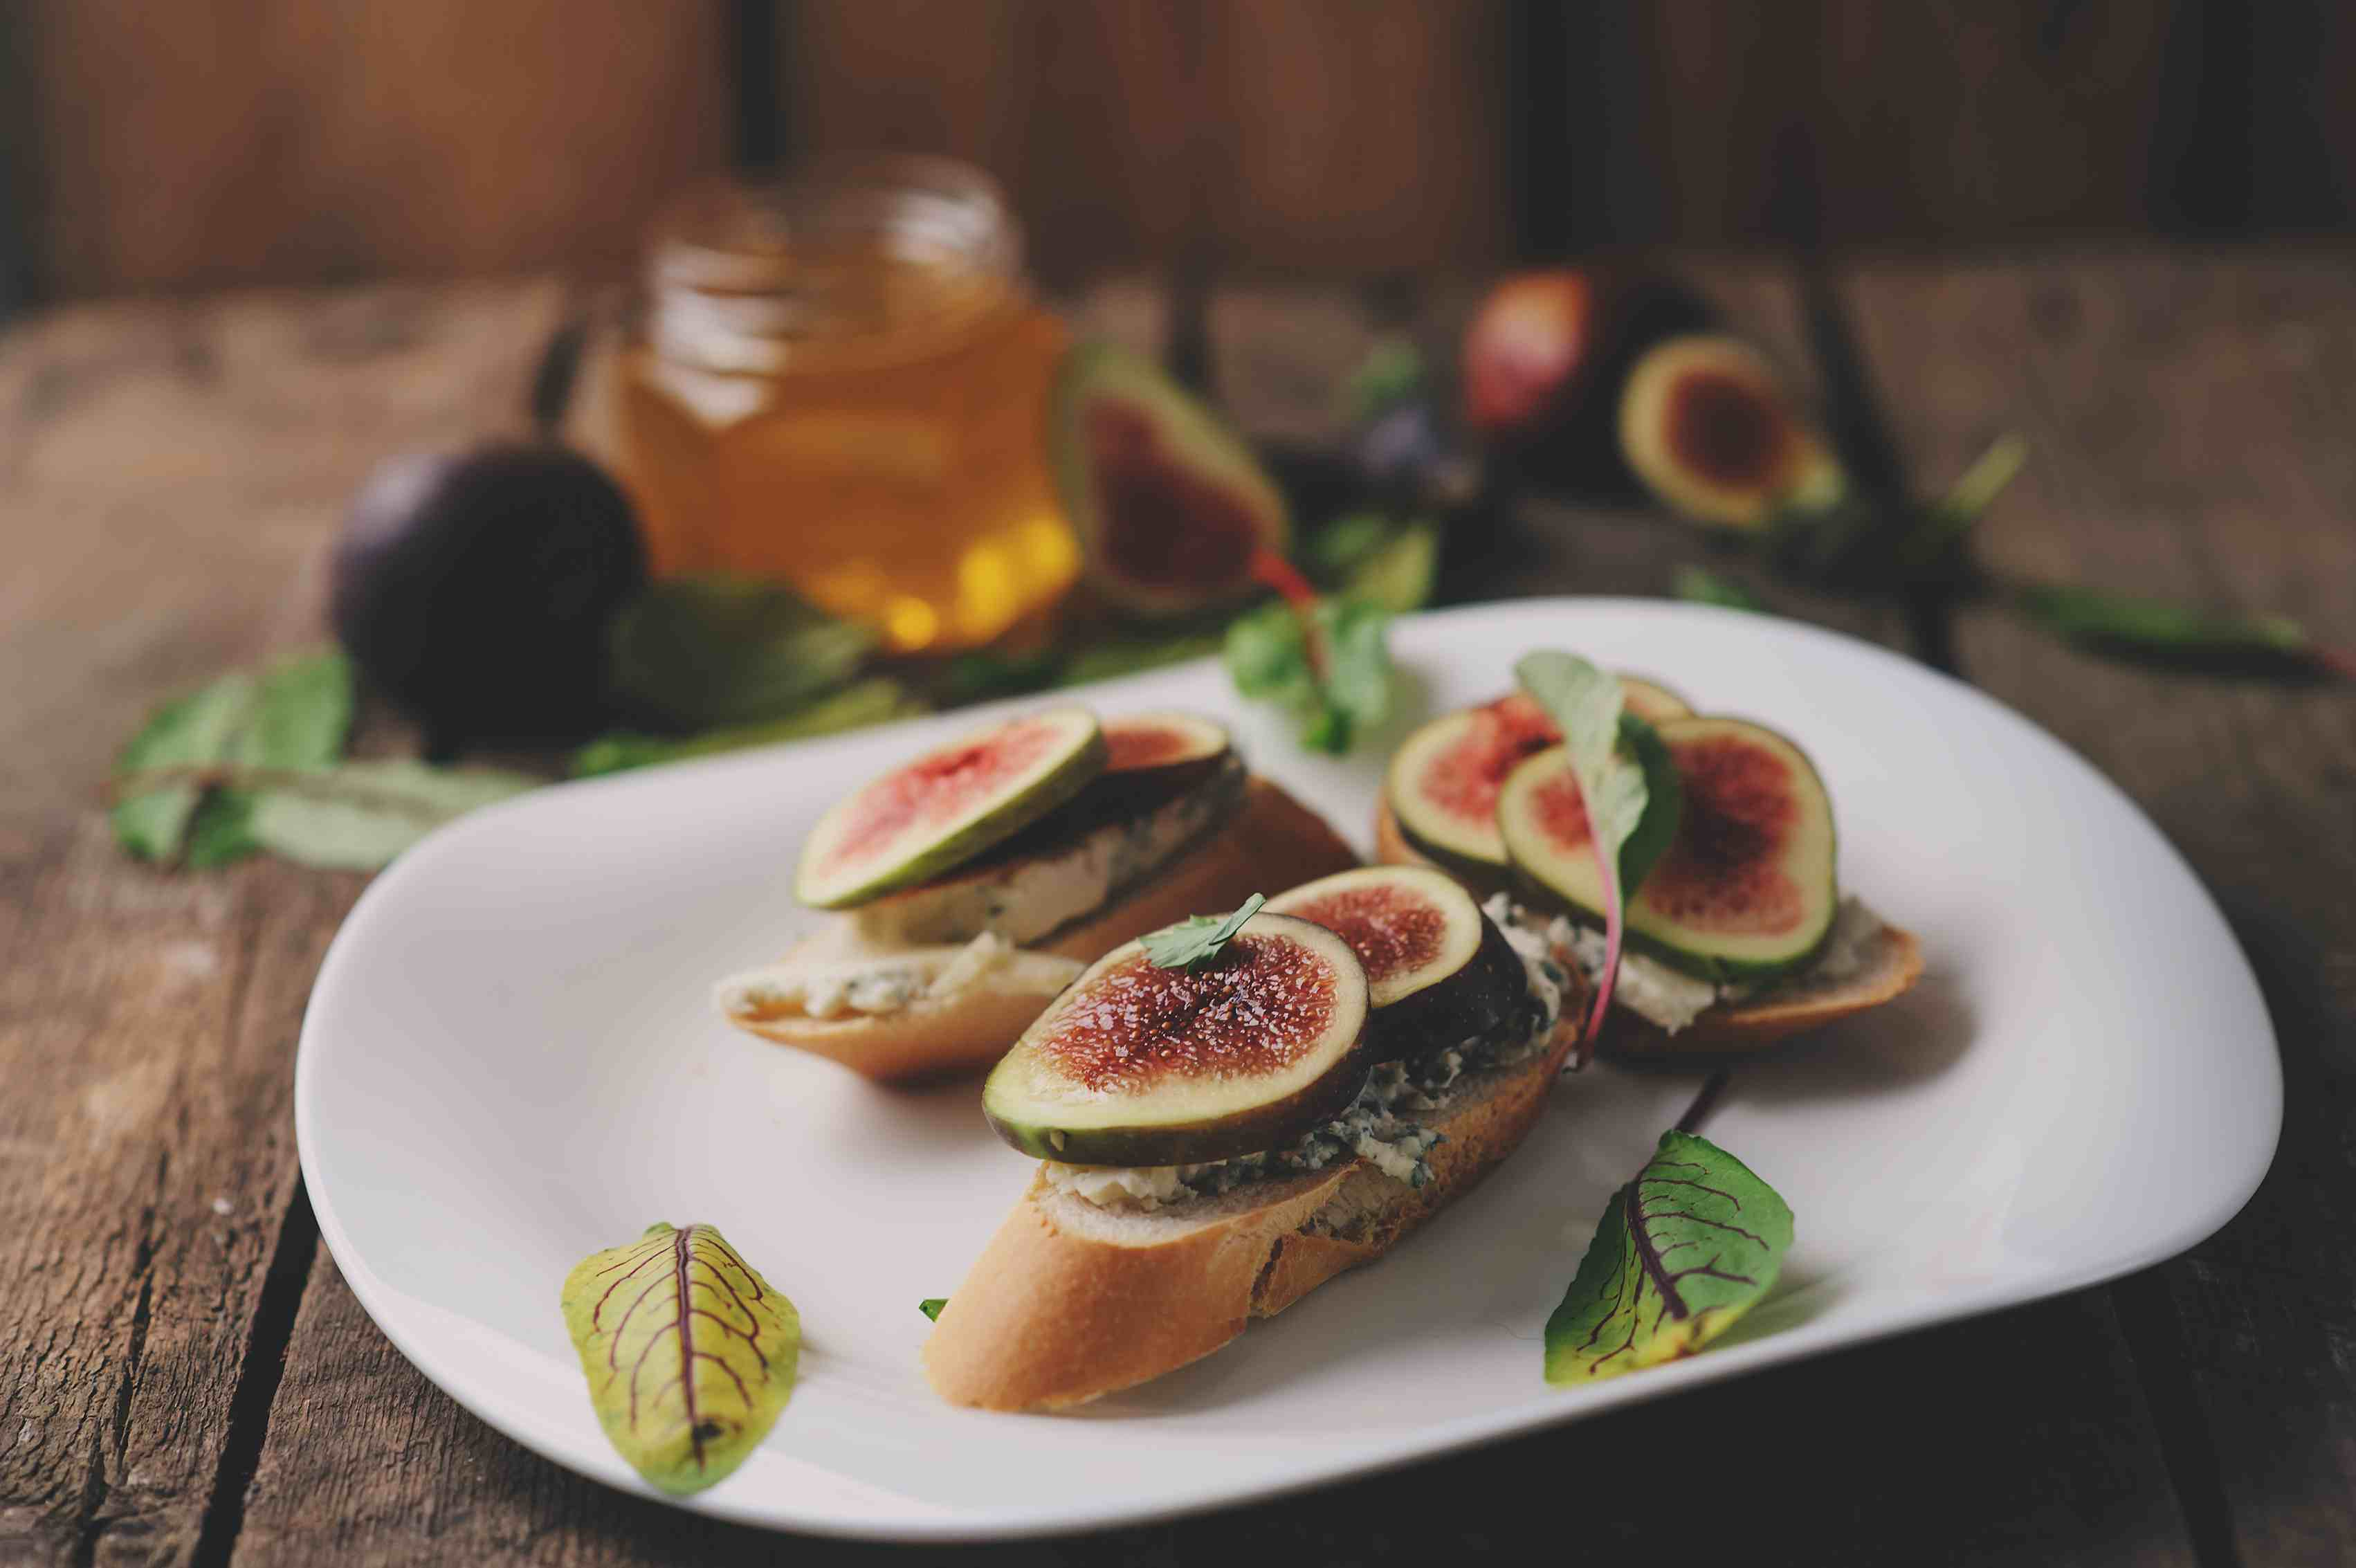 Fig Crostini Is an Impressive Appetizer